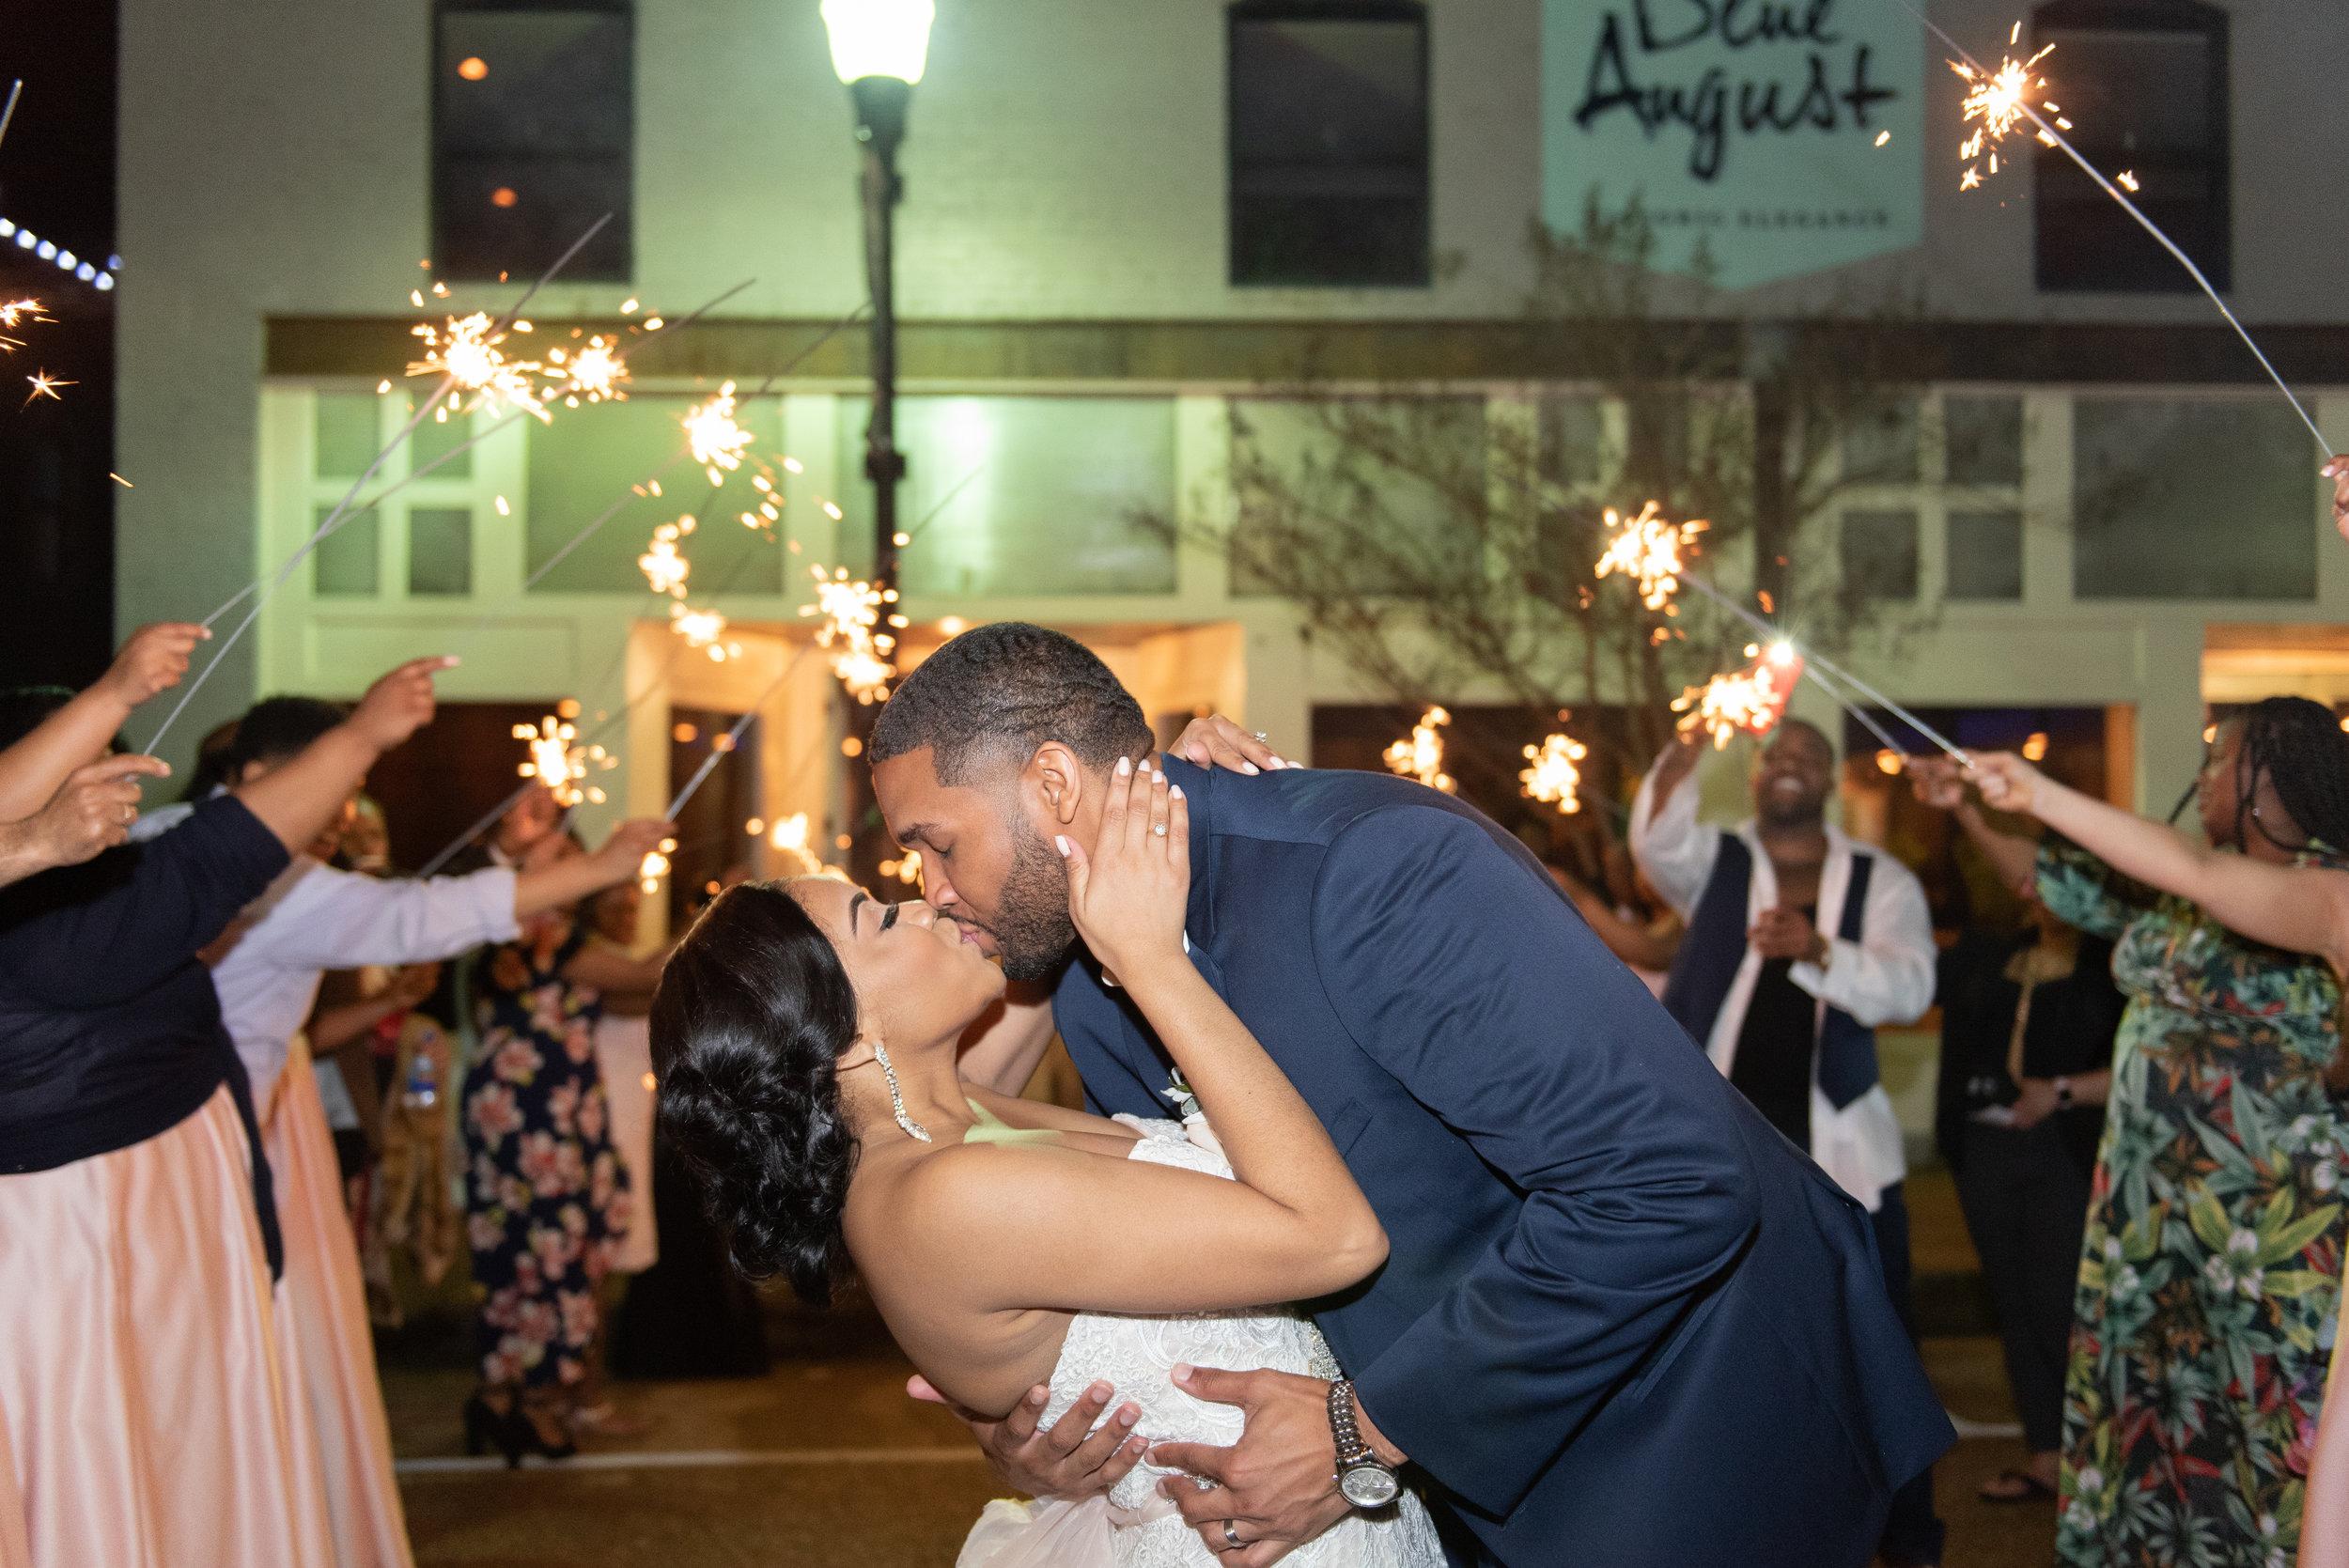 DuBose Wedding (unwatermarked) (2 of 2).jpg